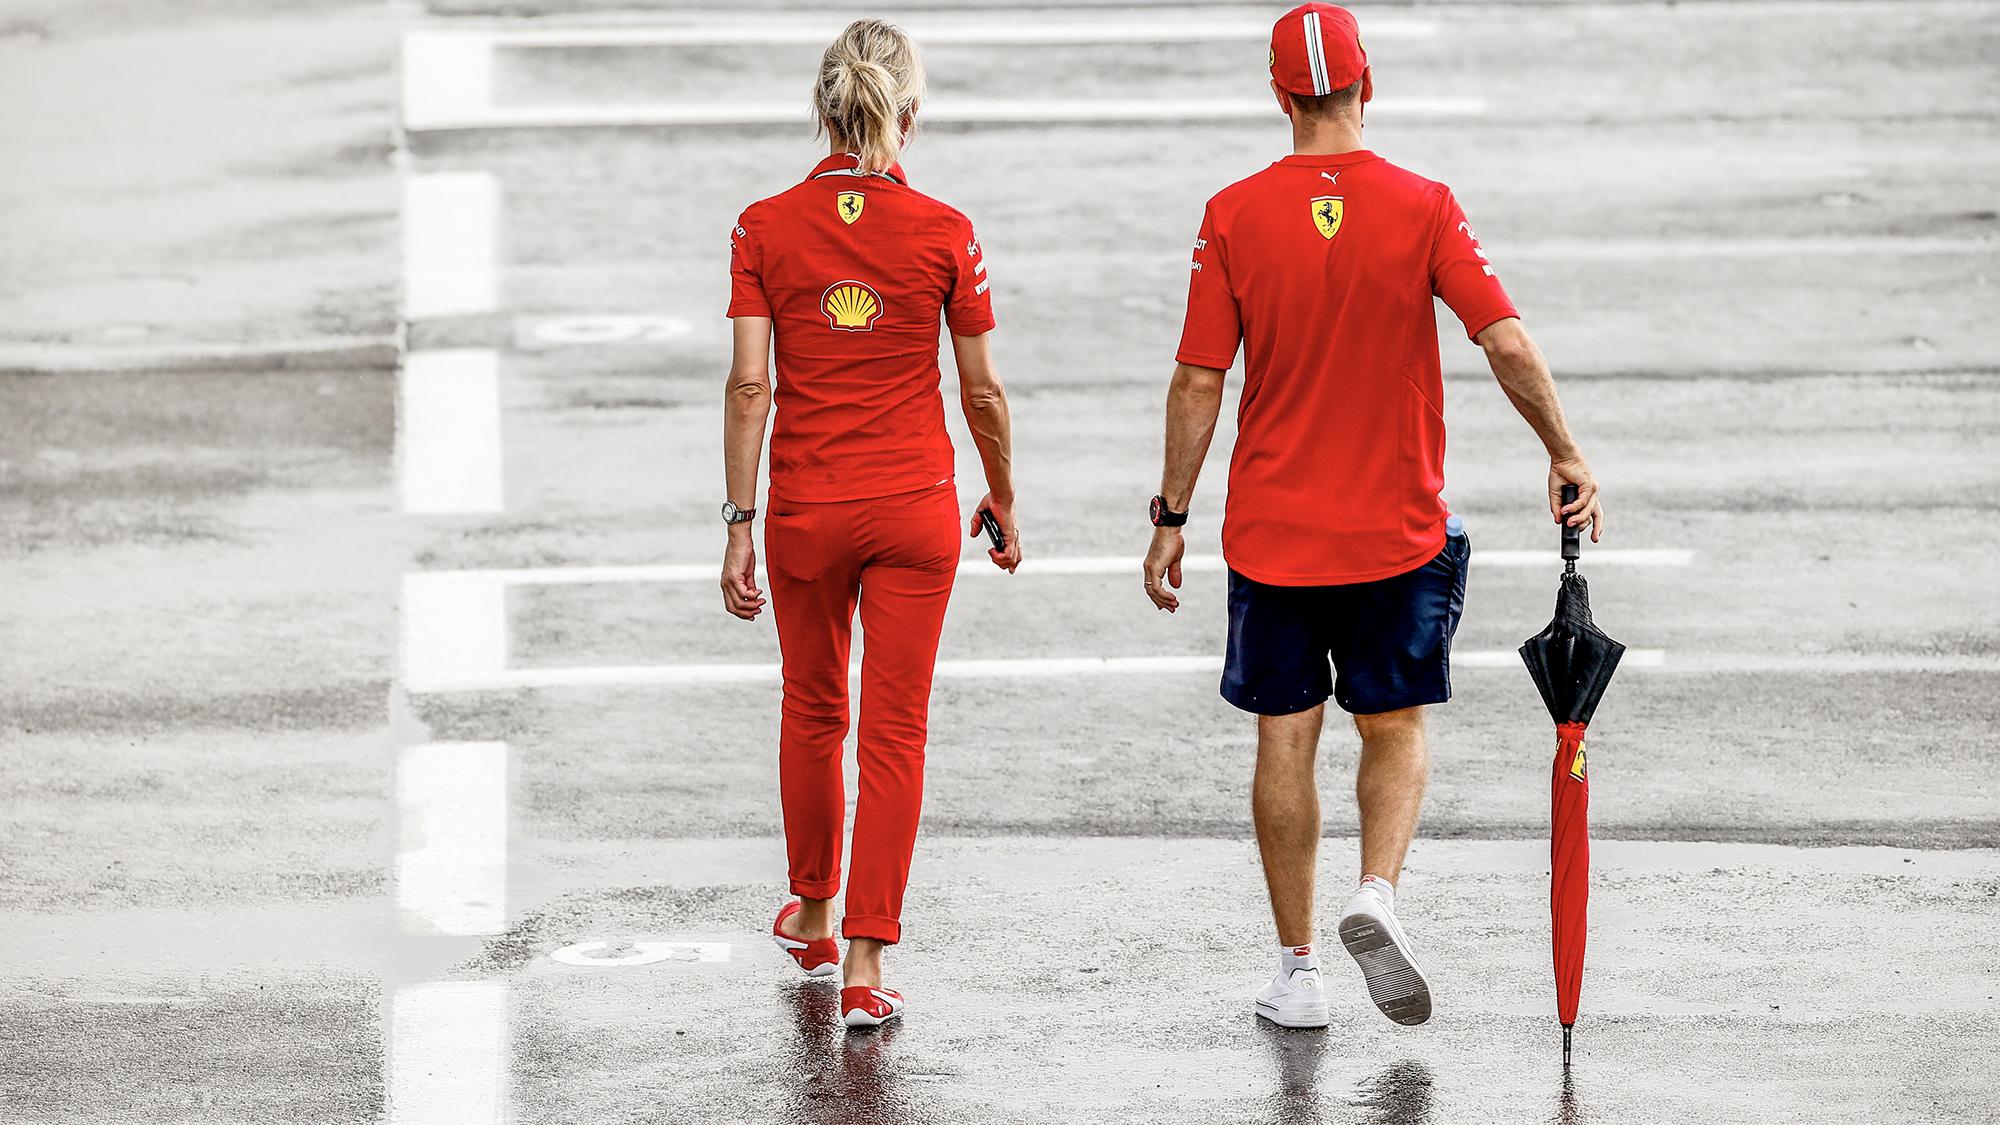 Sebastian Vettel walks through a wet paddock with an umbrella at the 2012 F1 Spanish Grand Prix